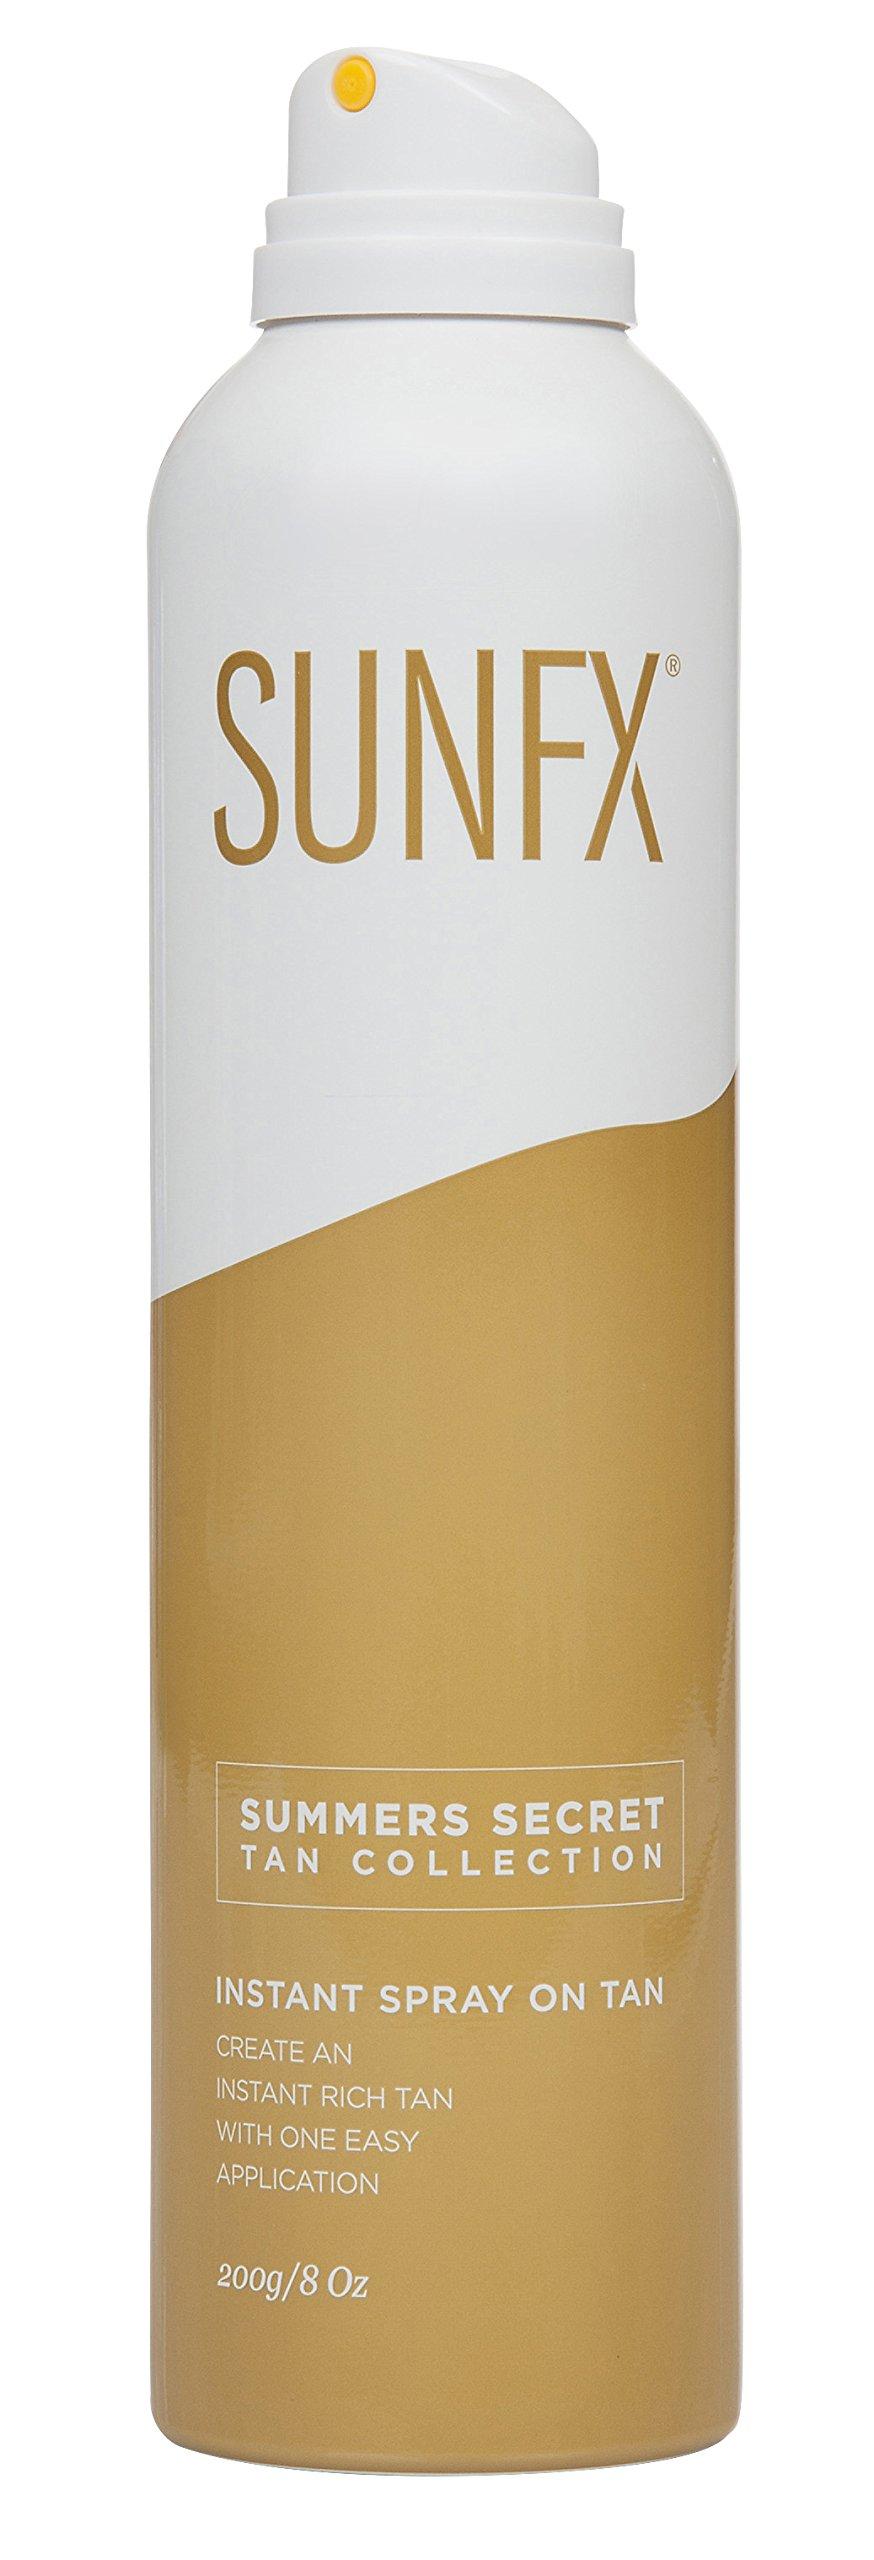 SunFX Summer's Secret Instant Bronzing Spray on Tan (4 Pack)